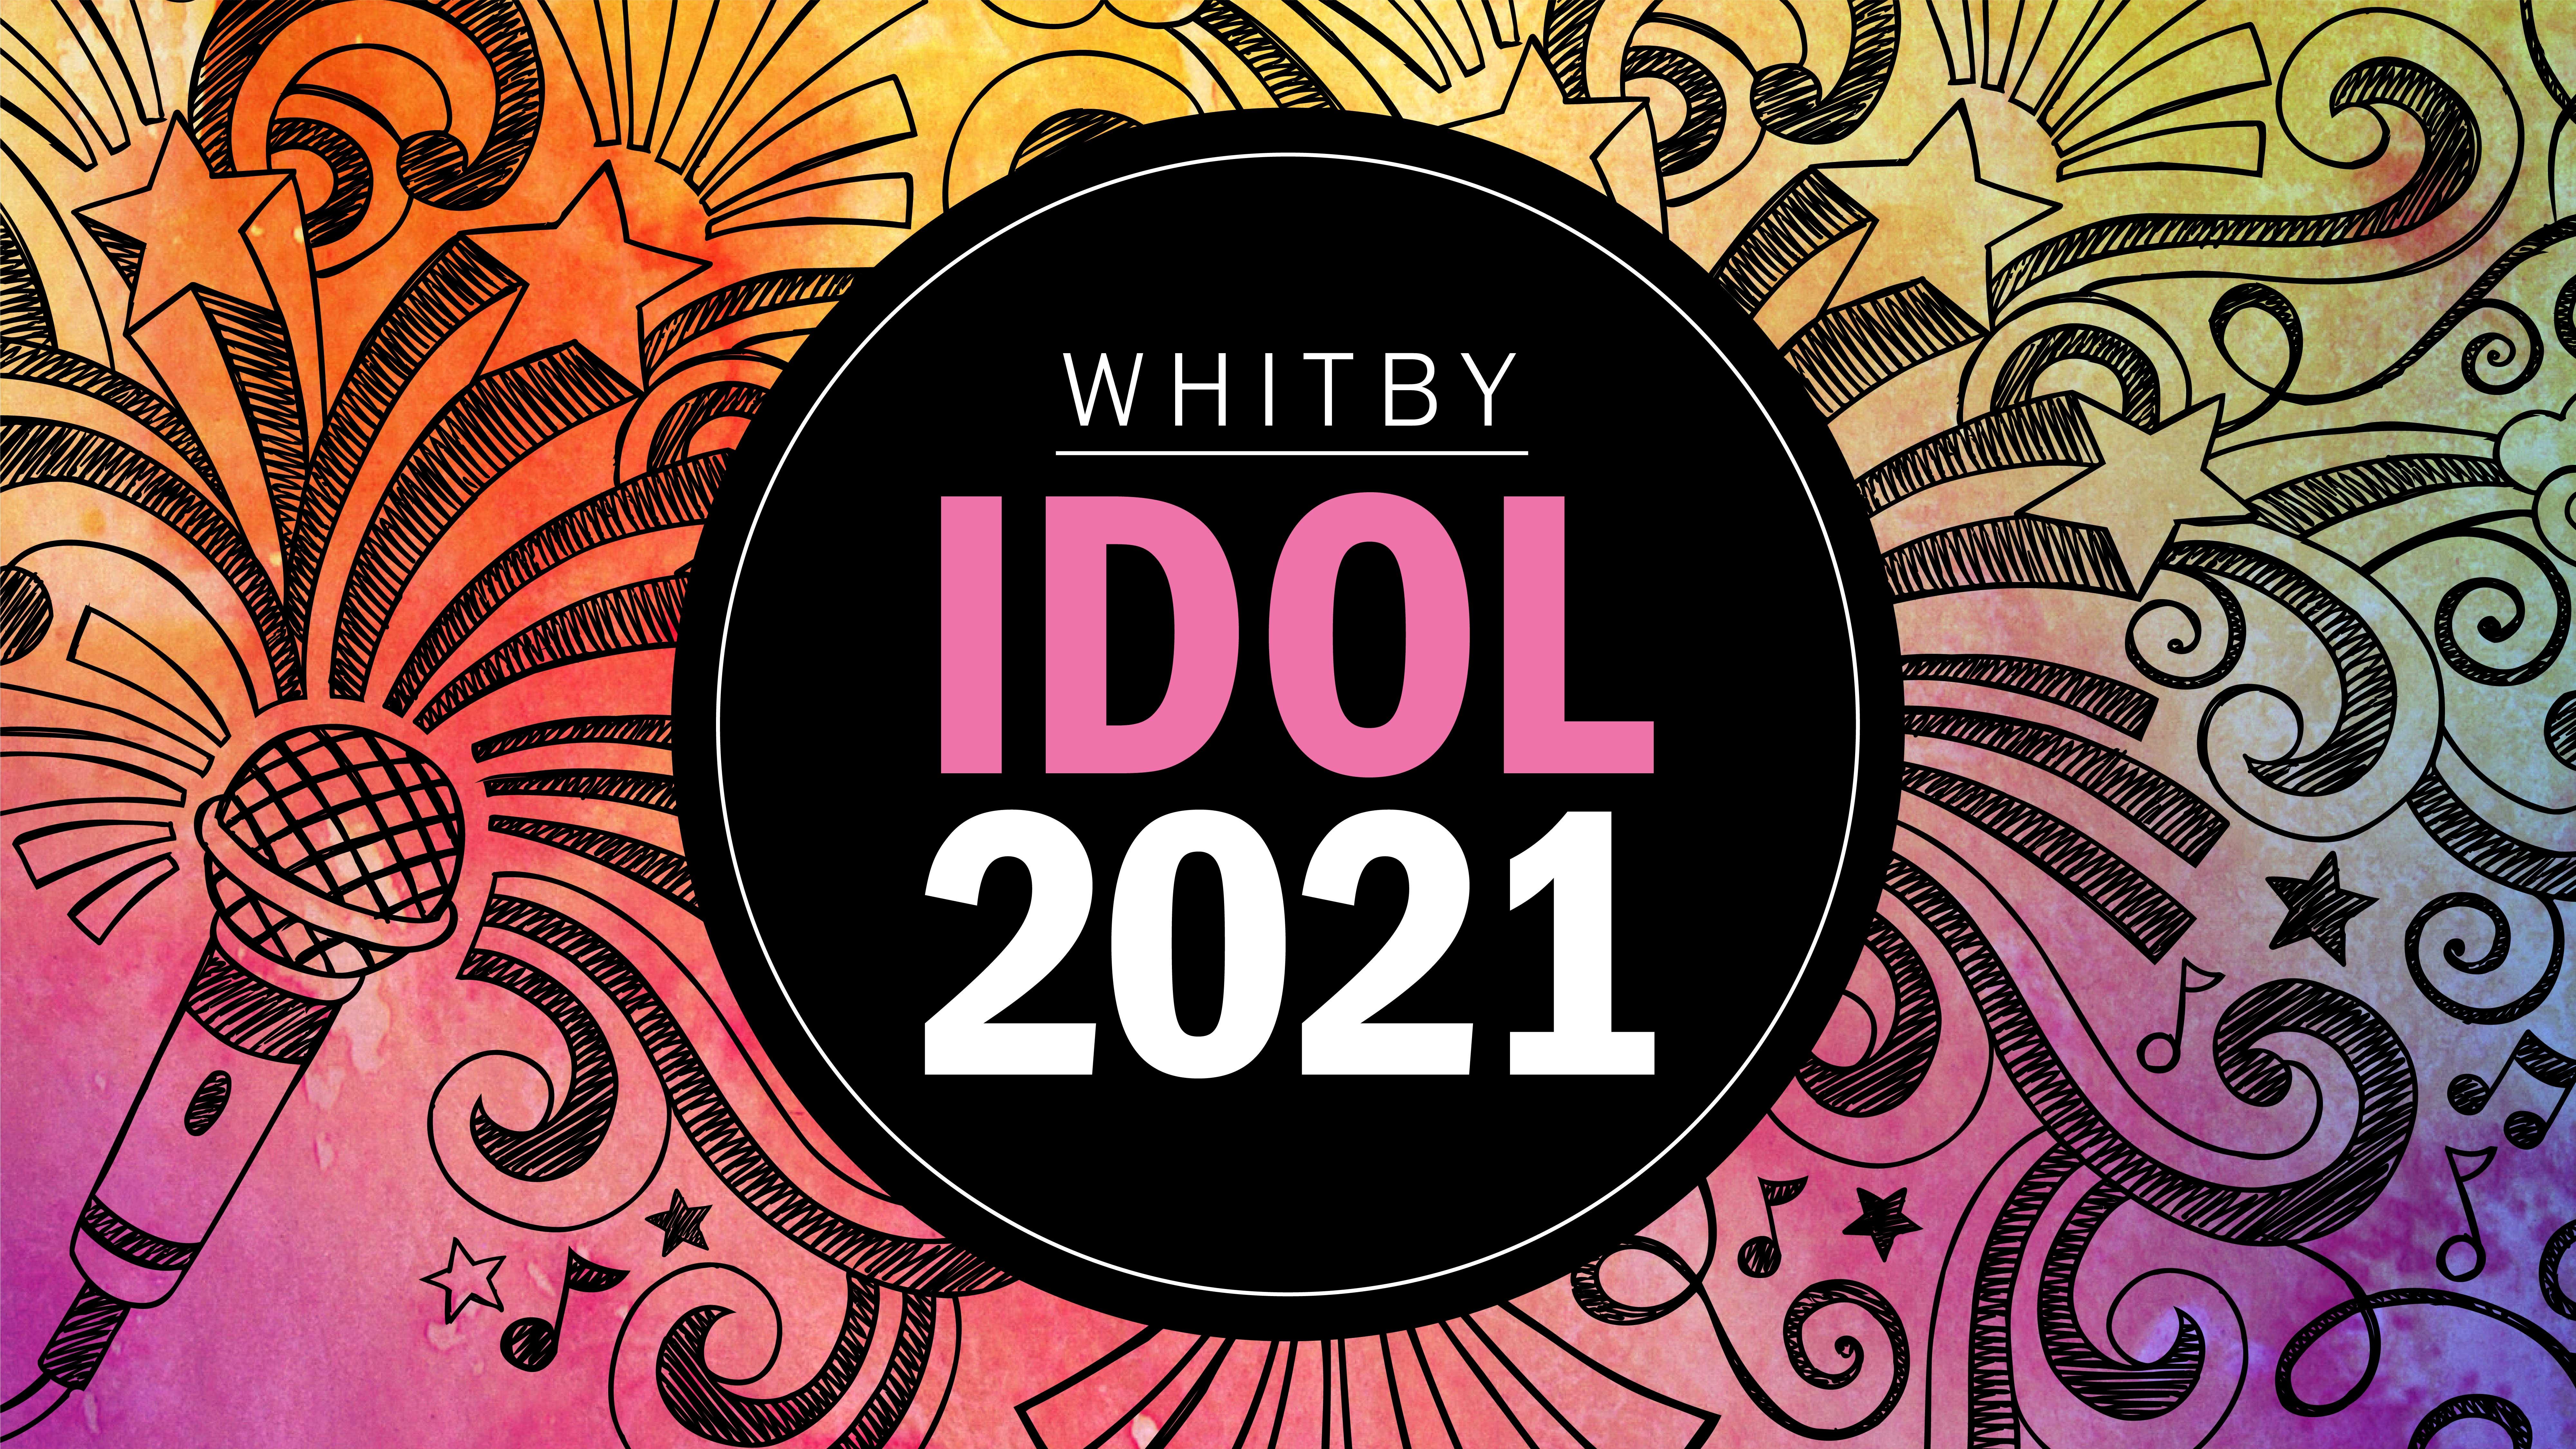 Whitby Idol 2021